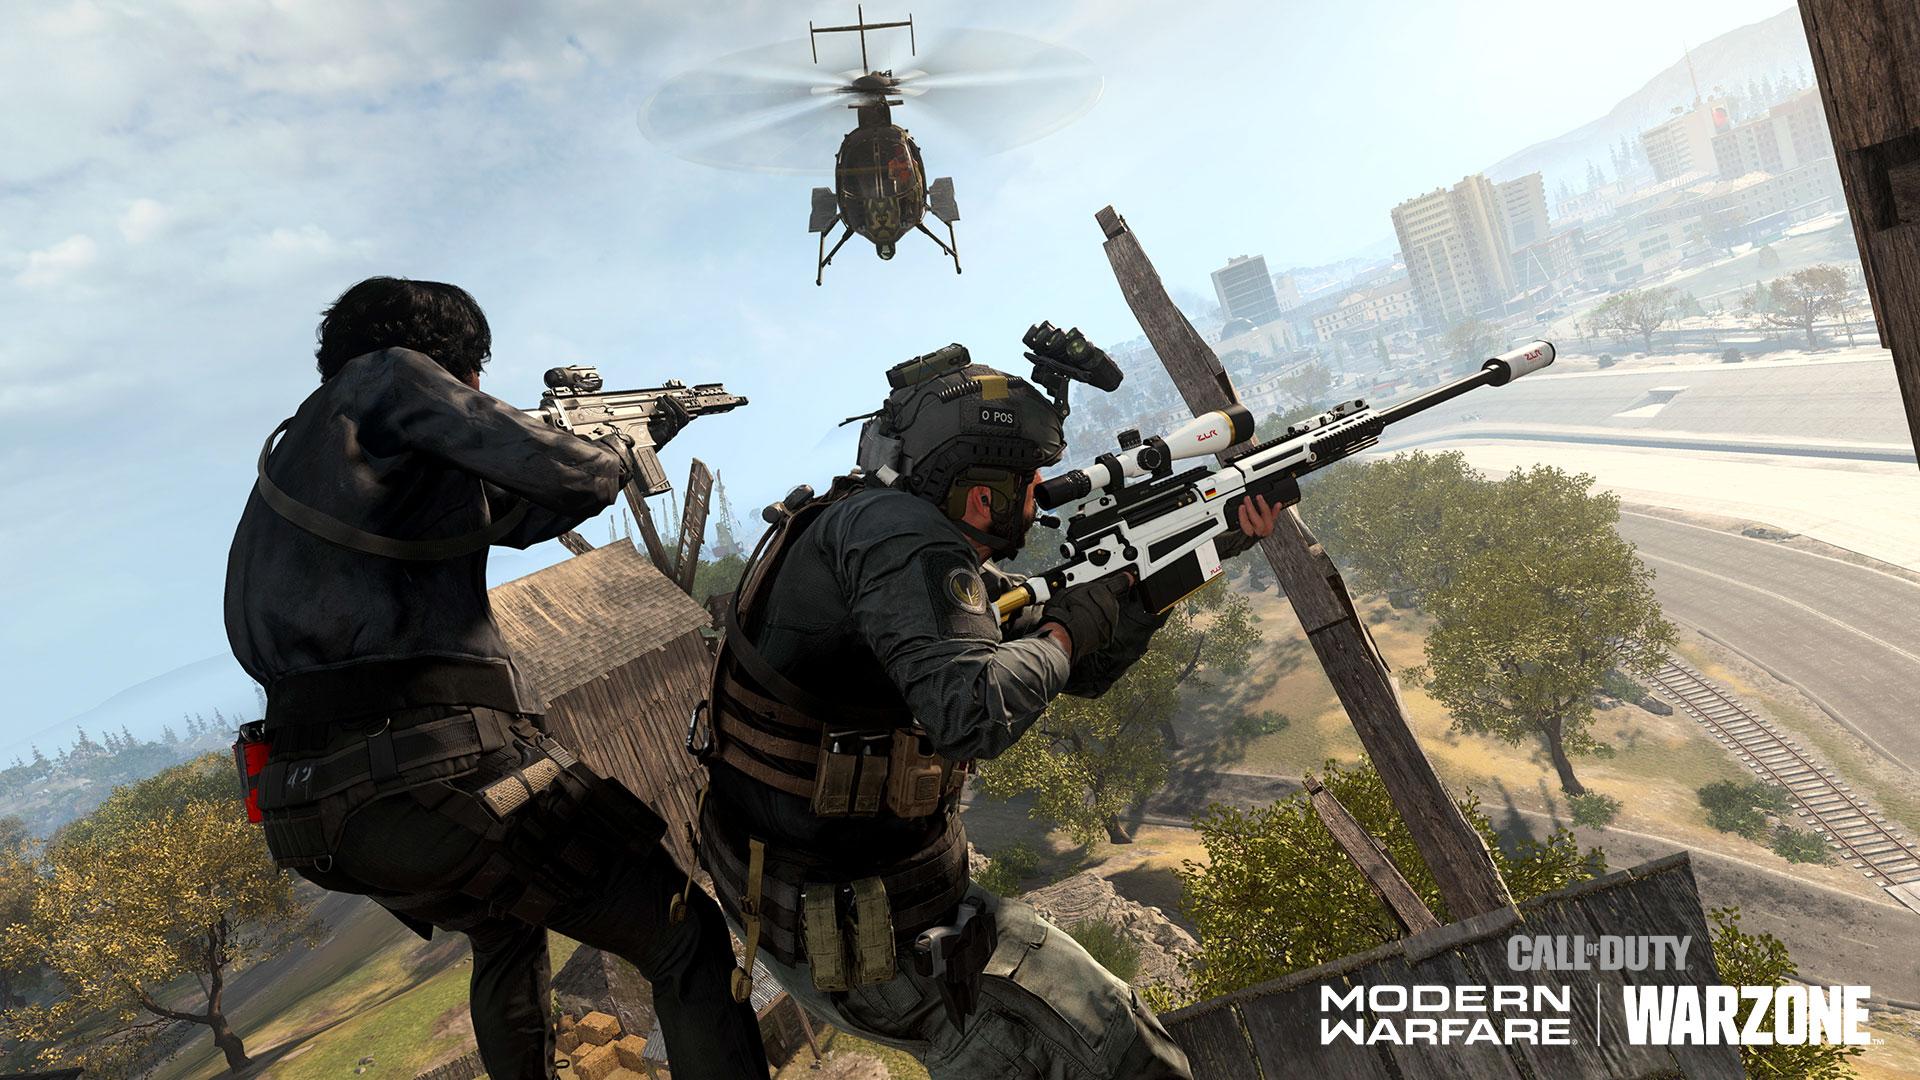 Call Of Duty Warzone Season 5 News On Twitter One Week Until